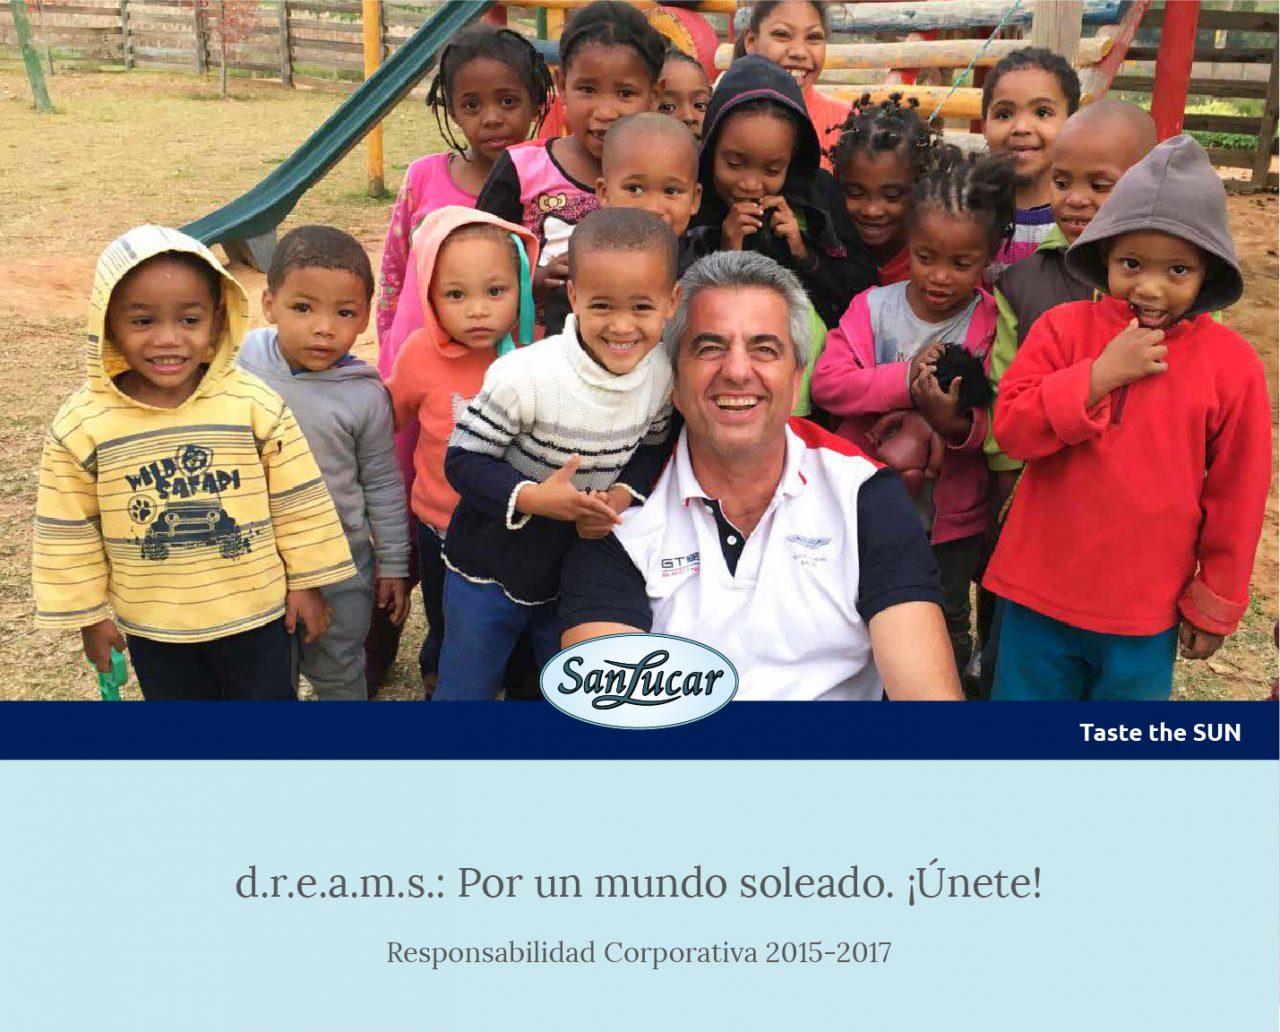 SanLucar new CR Report